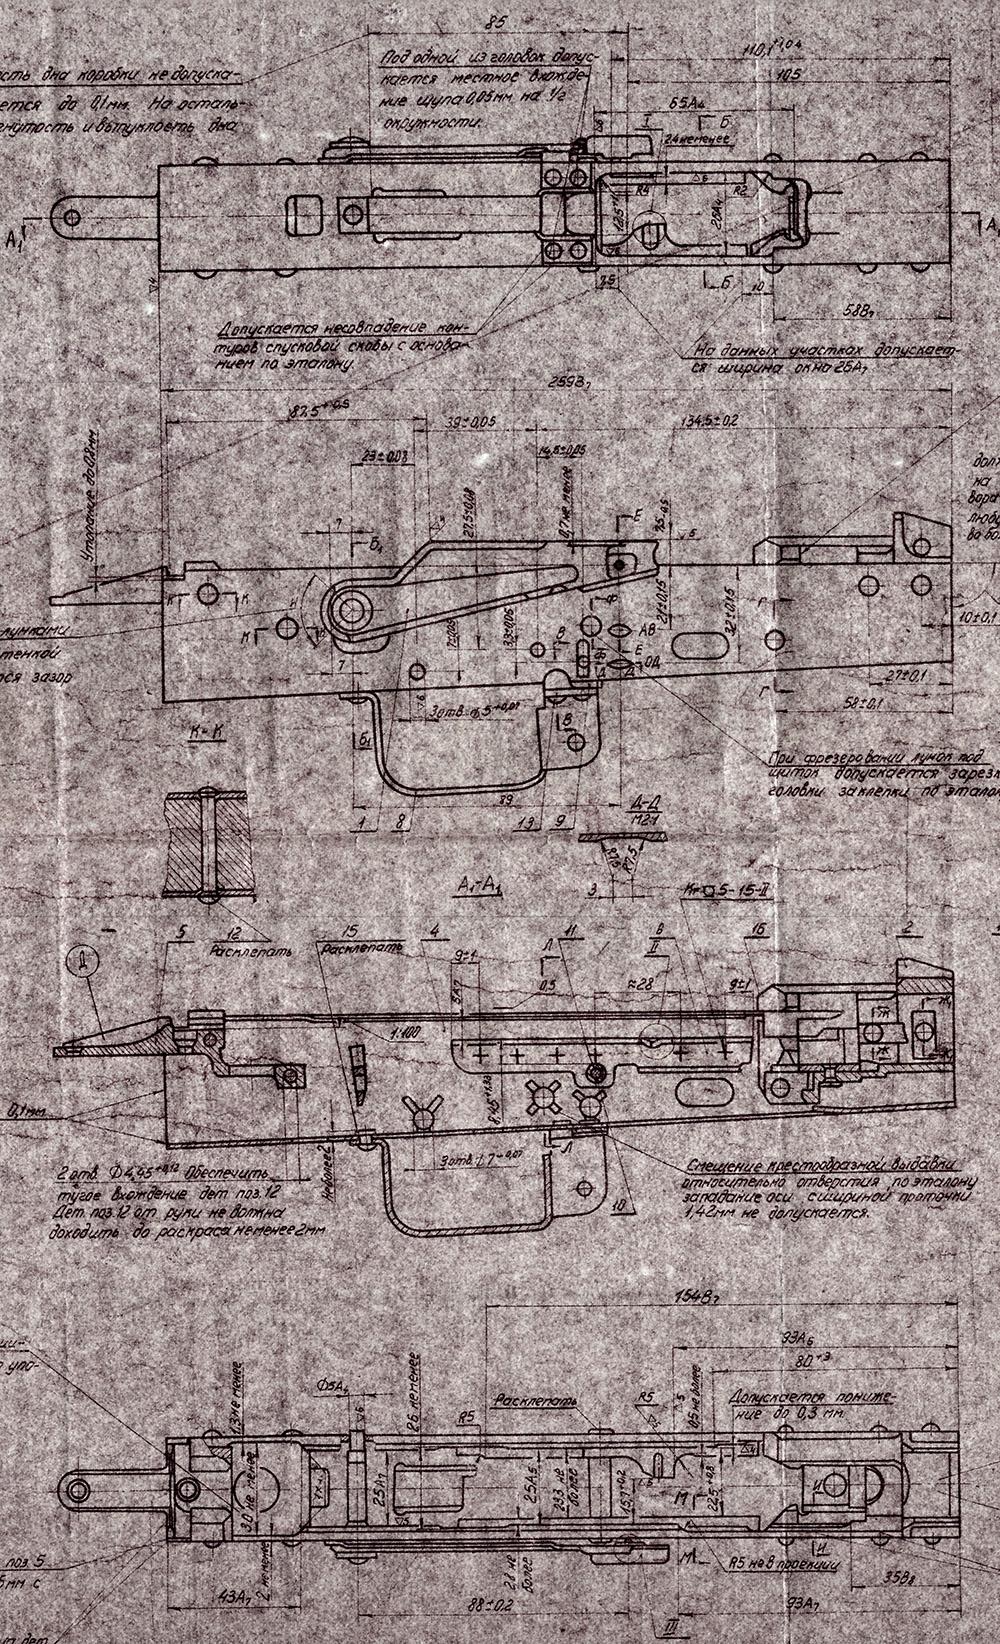 AK-47, AKM, Magazin, Bayonet, and Cleaning Kit Blueprints